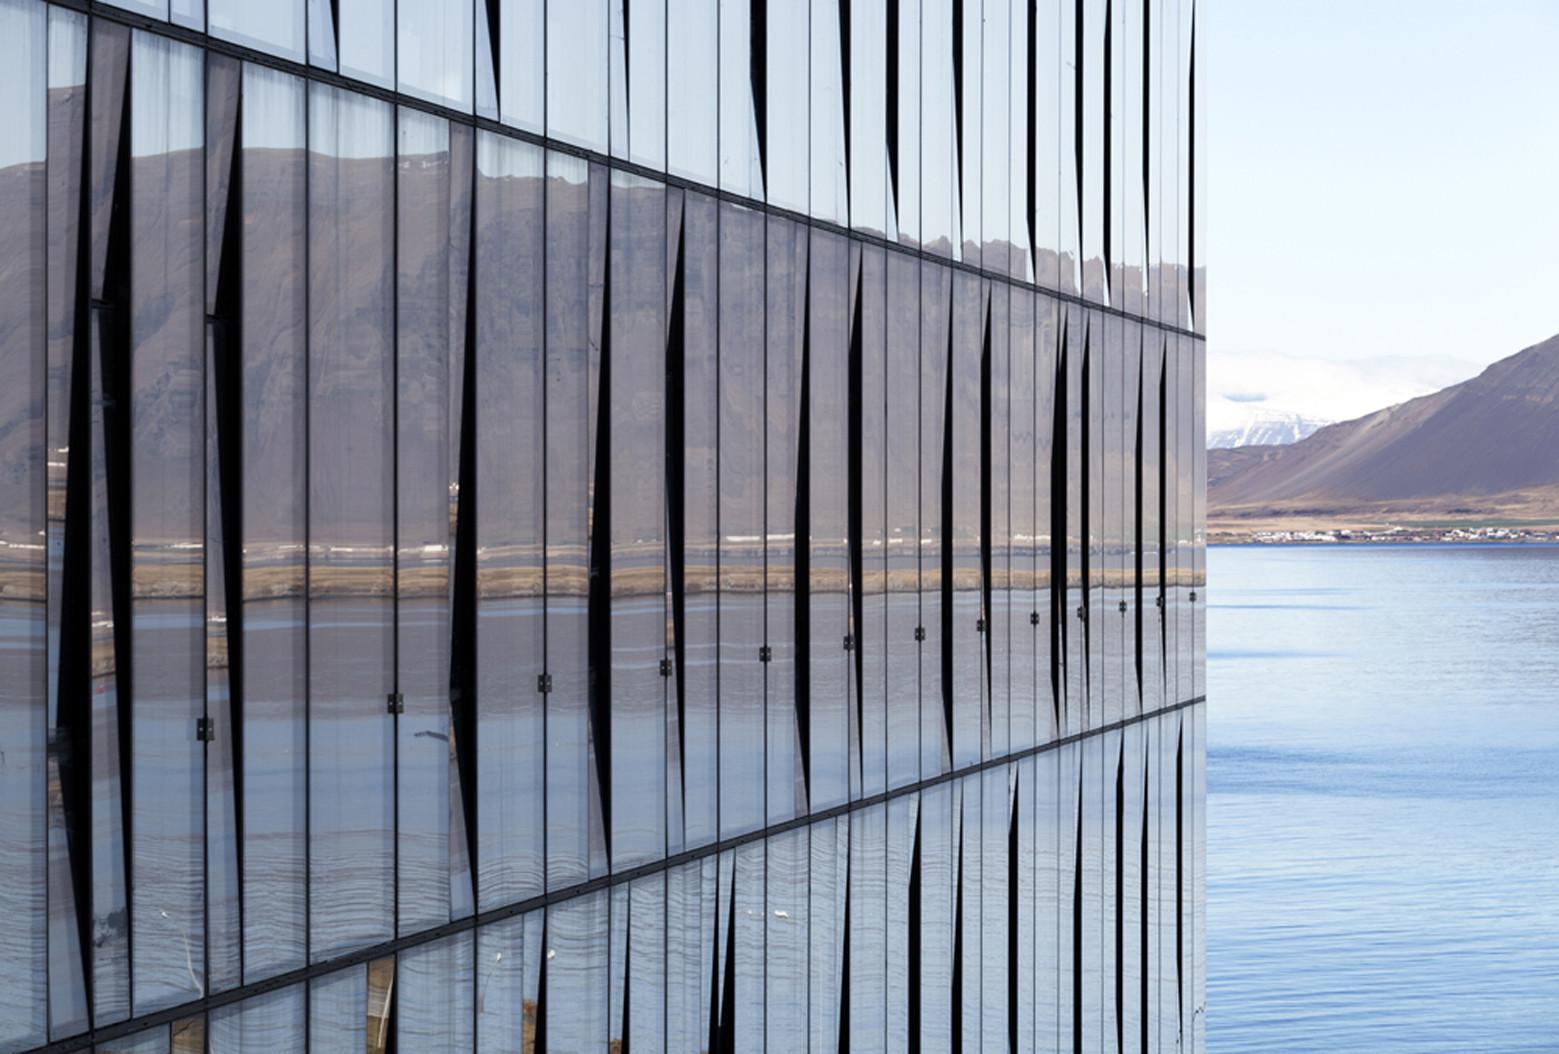 Curtain Wall Architecture : Turninn pk arkitektar archdaily